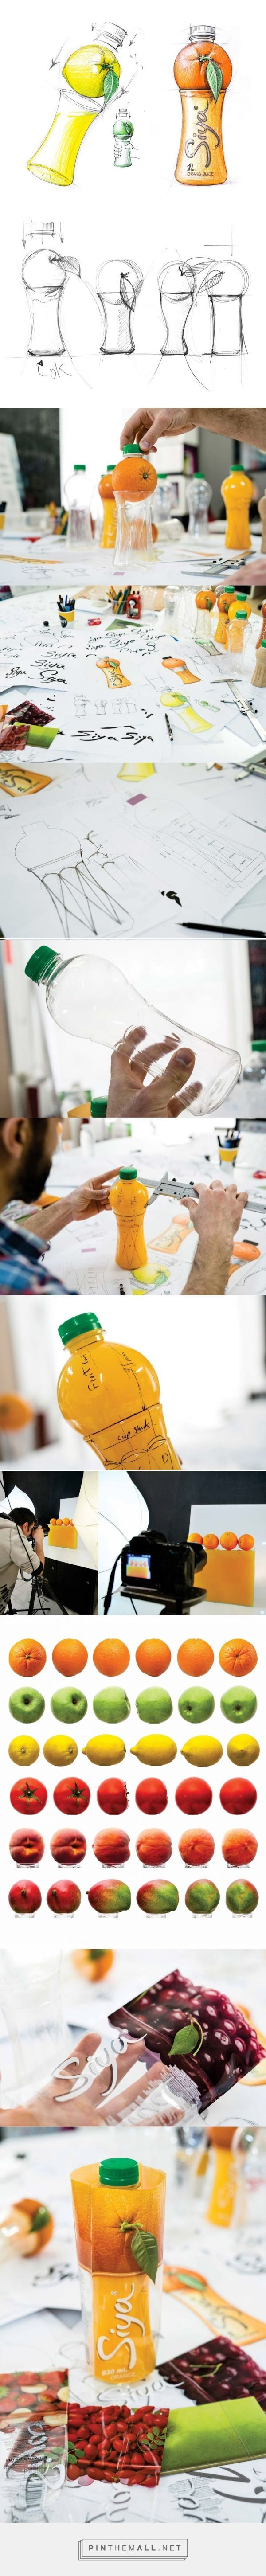 Siya Juice Packaging Development by Backbone Branding -